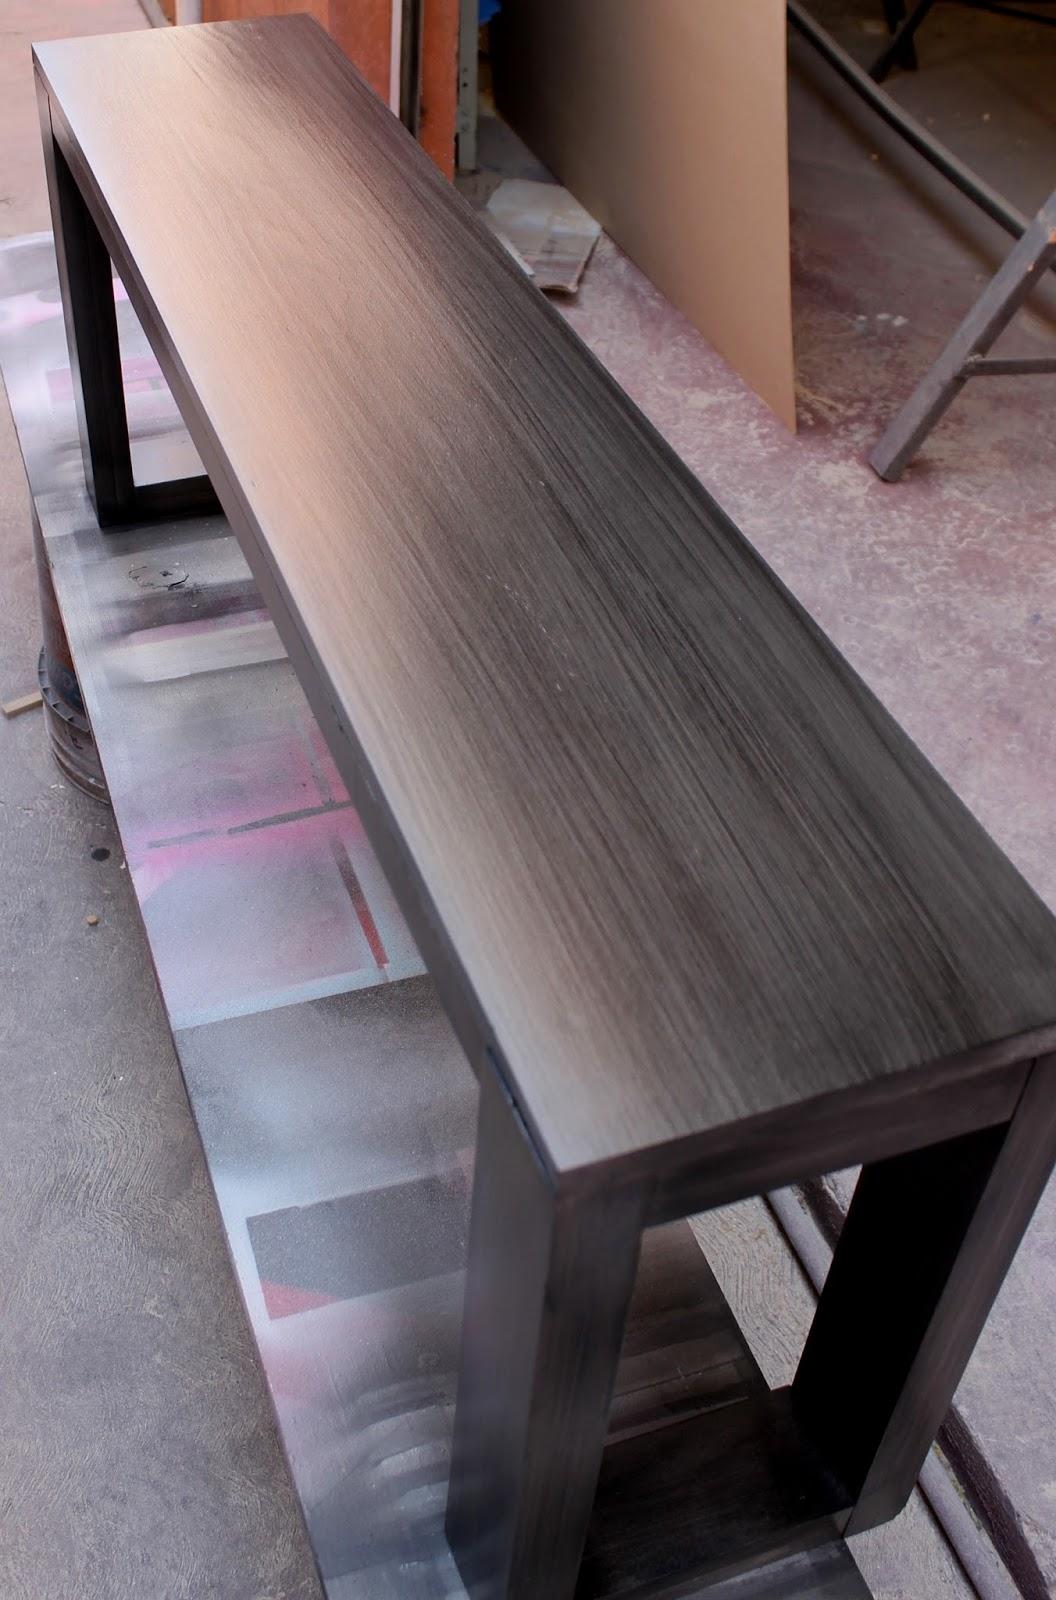 Bancos de madera para comedor affordable full size of sillas de madera para comedor precios mil - Bancas de madera para comedor ...